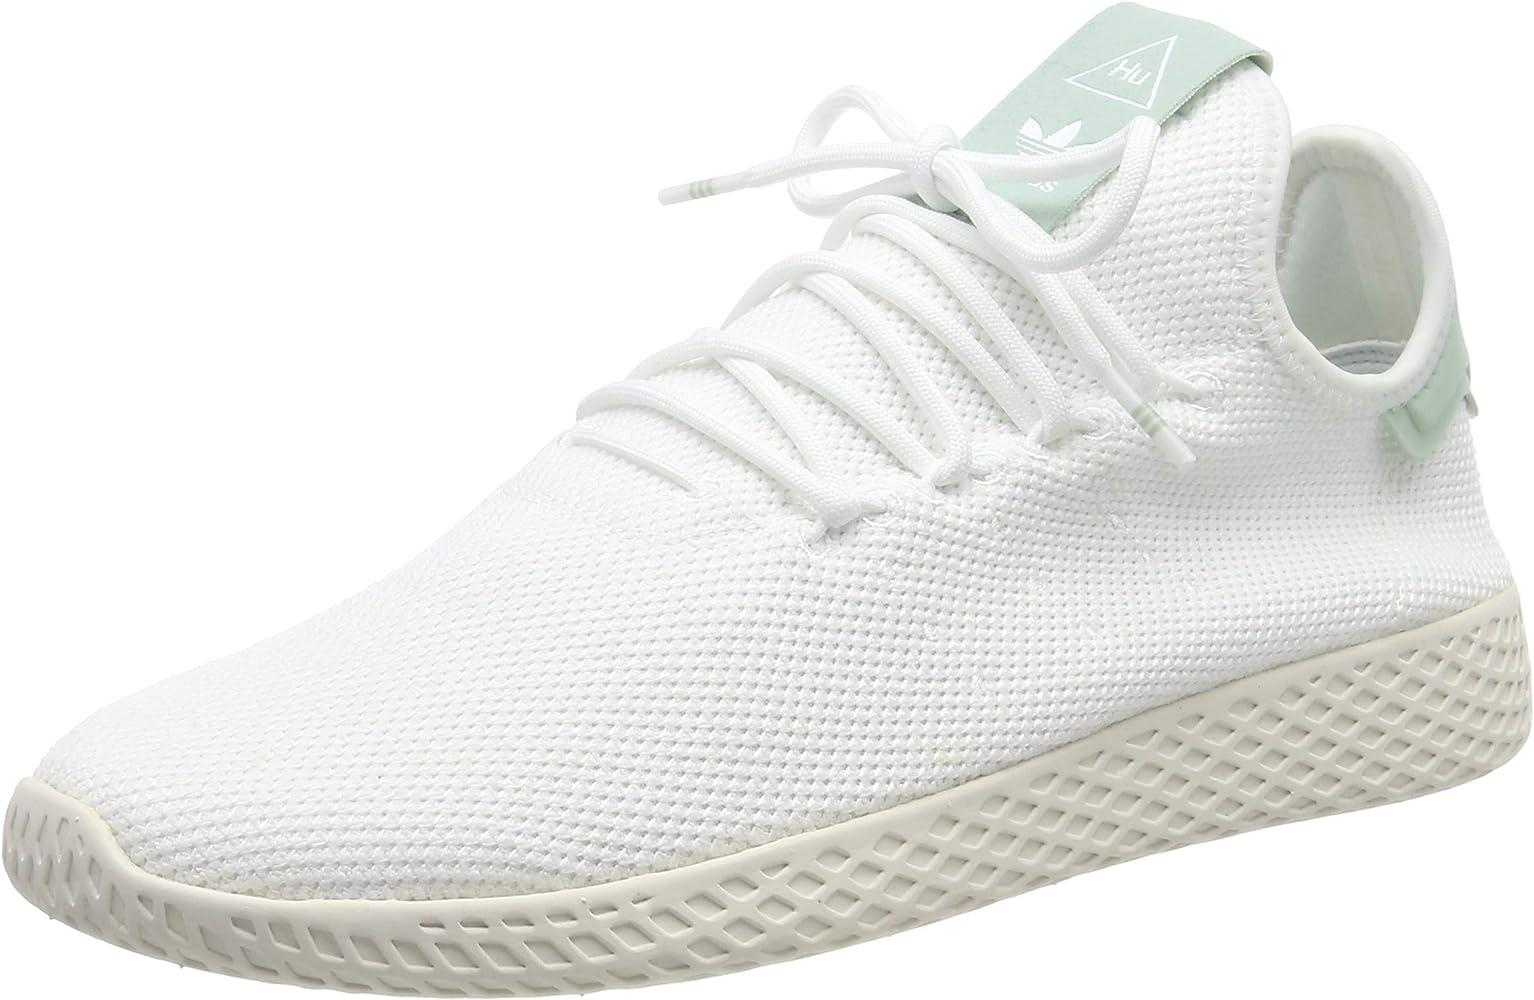 adidas Originals Sneaker PW Tennis HU CQ2168 Weiß Türkis, Schuhgröße:44 23